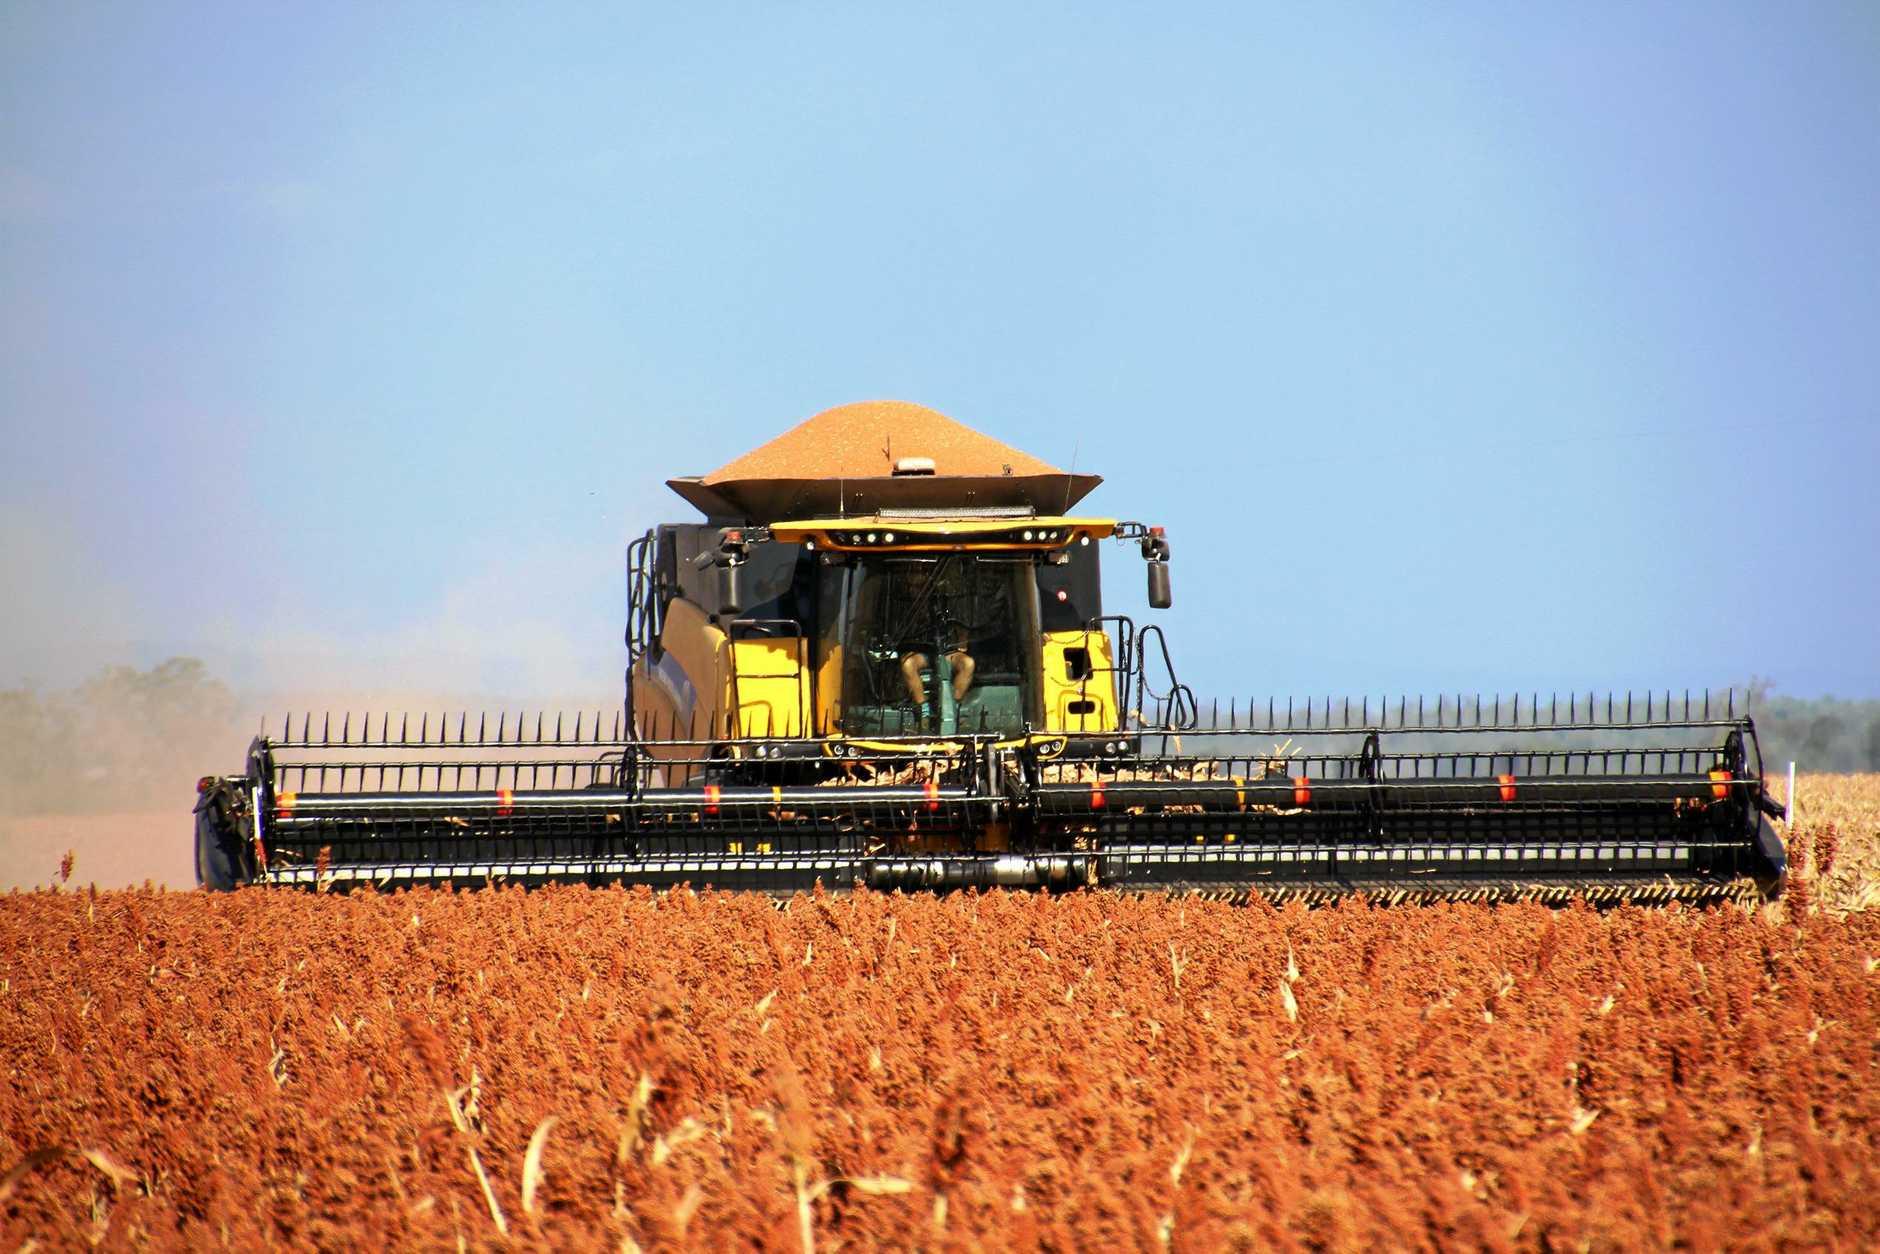 Sorghum harvest in full swing all around Langlands, near Jandowae, in the heatwave.